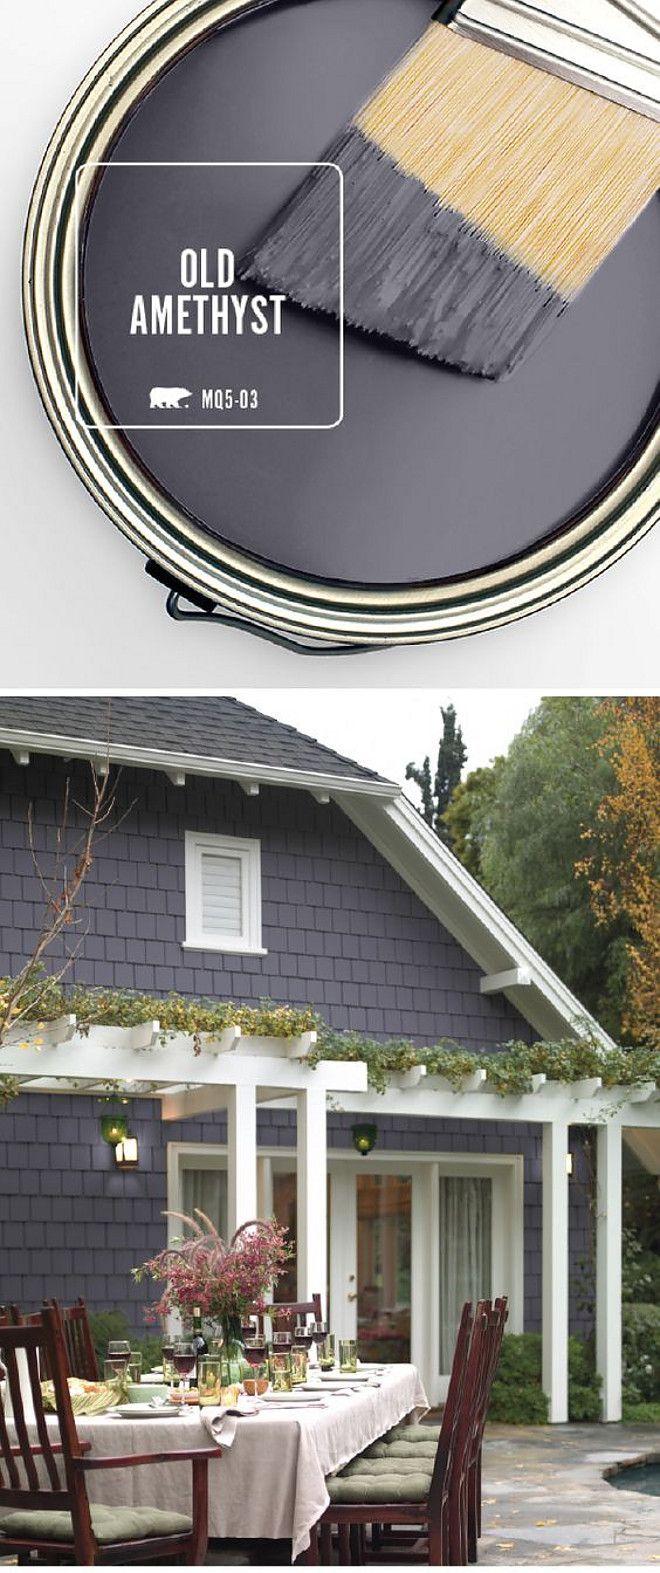 Best Dark Grey Exterior Paint Color Best Dark Grey Exterior Paint Color Ideas Behr Old Ame Exterior House Colors Exterior Paint Colors For House House Colors